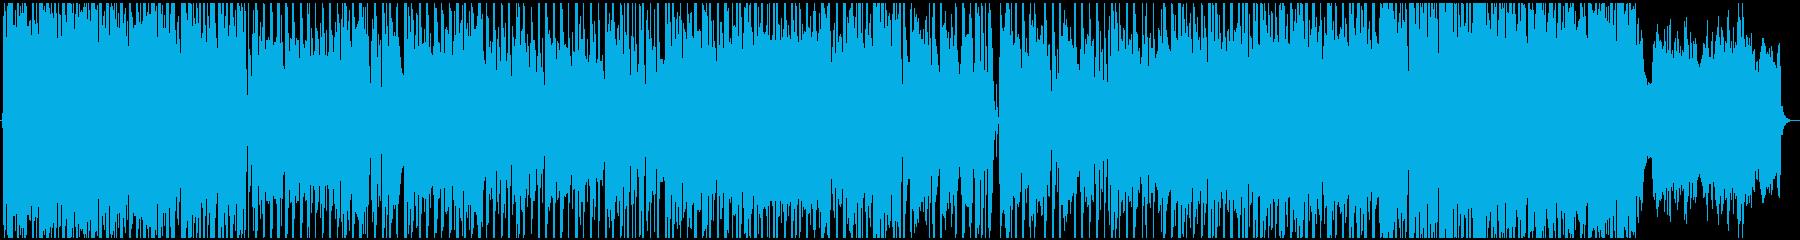 Pop BGM that feels awkward's reproduced waveform